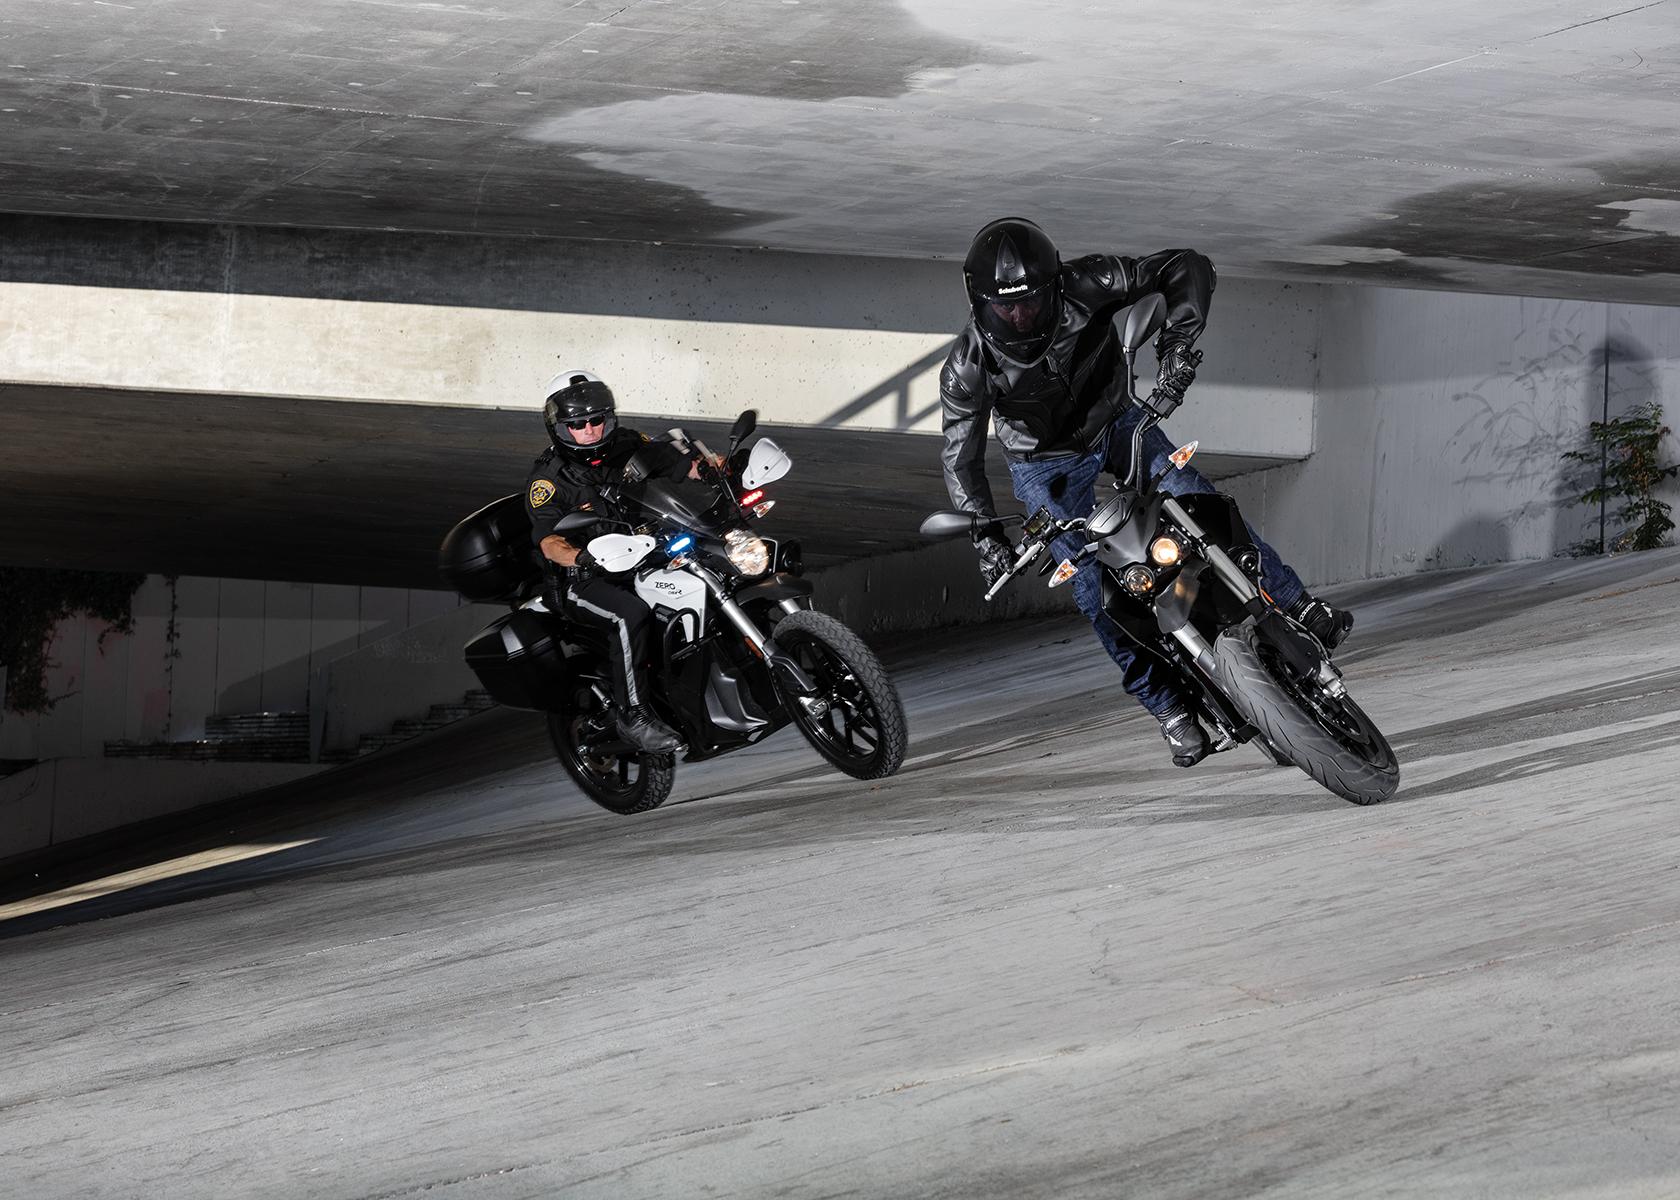 2017 Zero Police Electric Motorcycle: